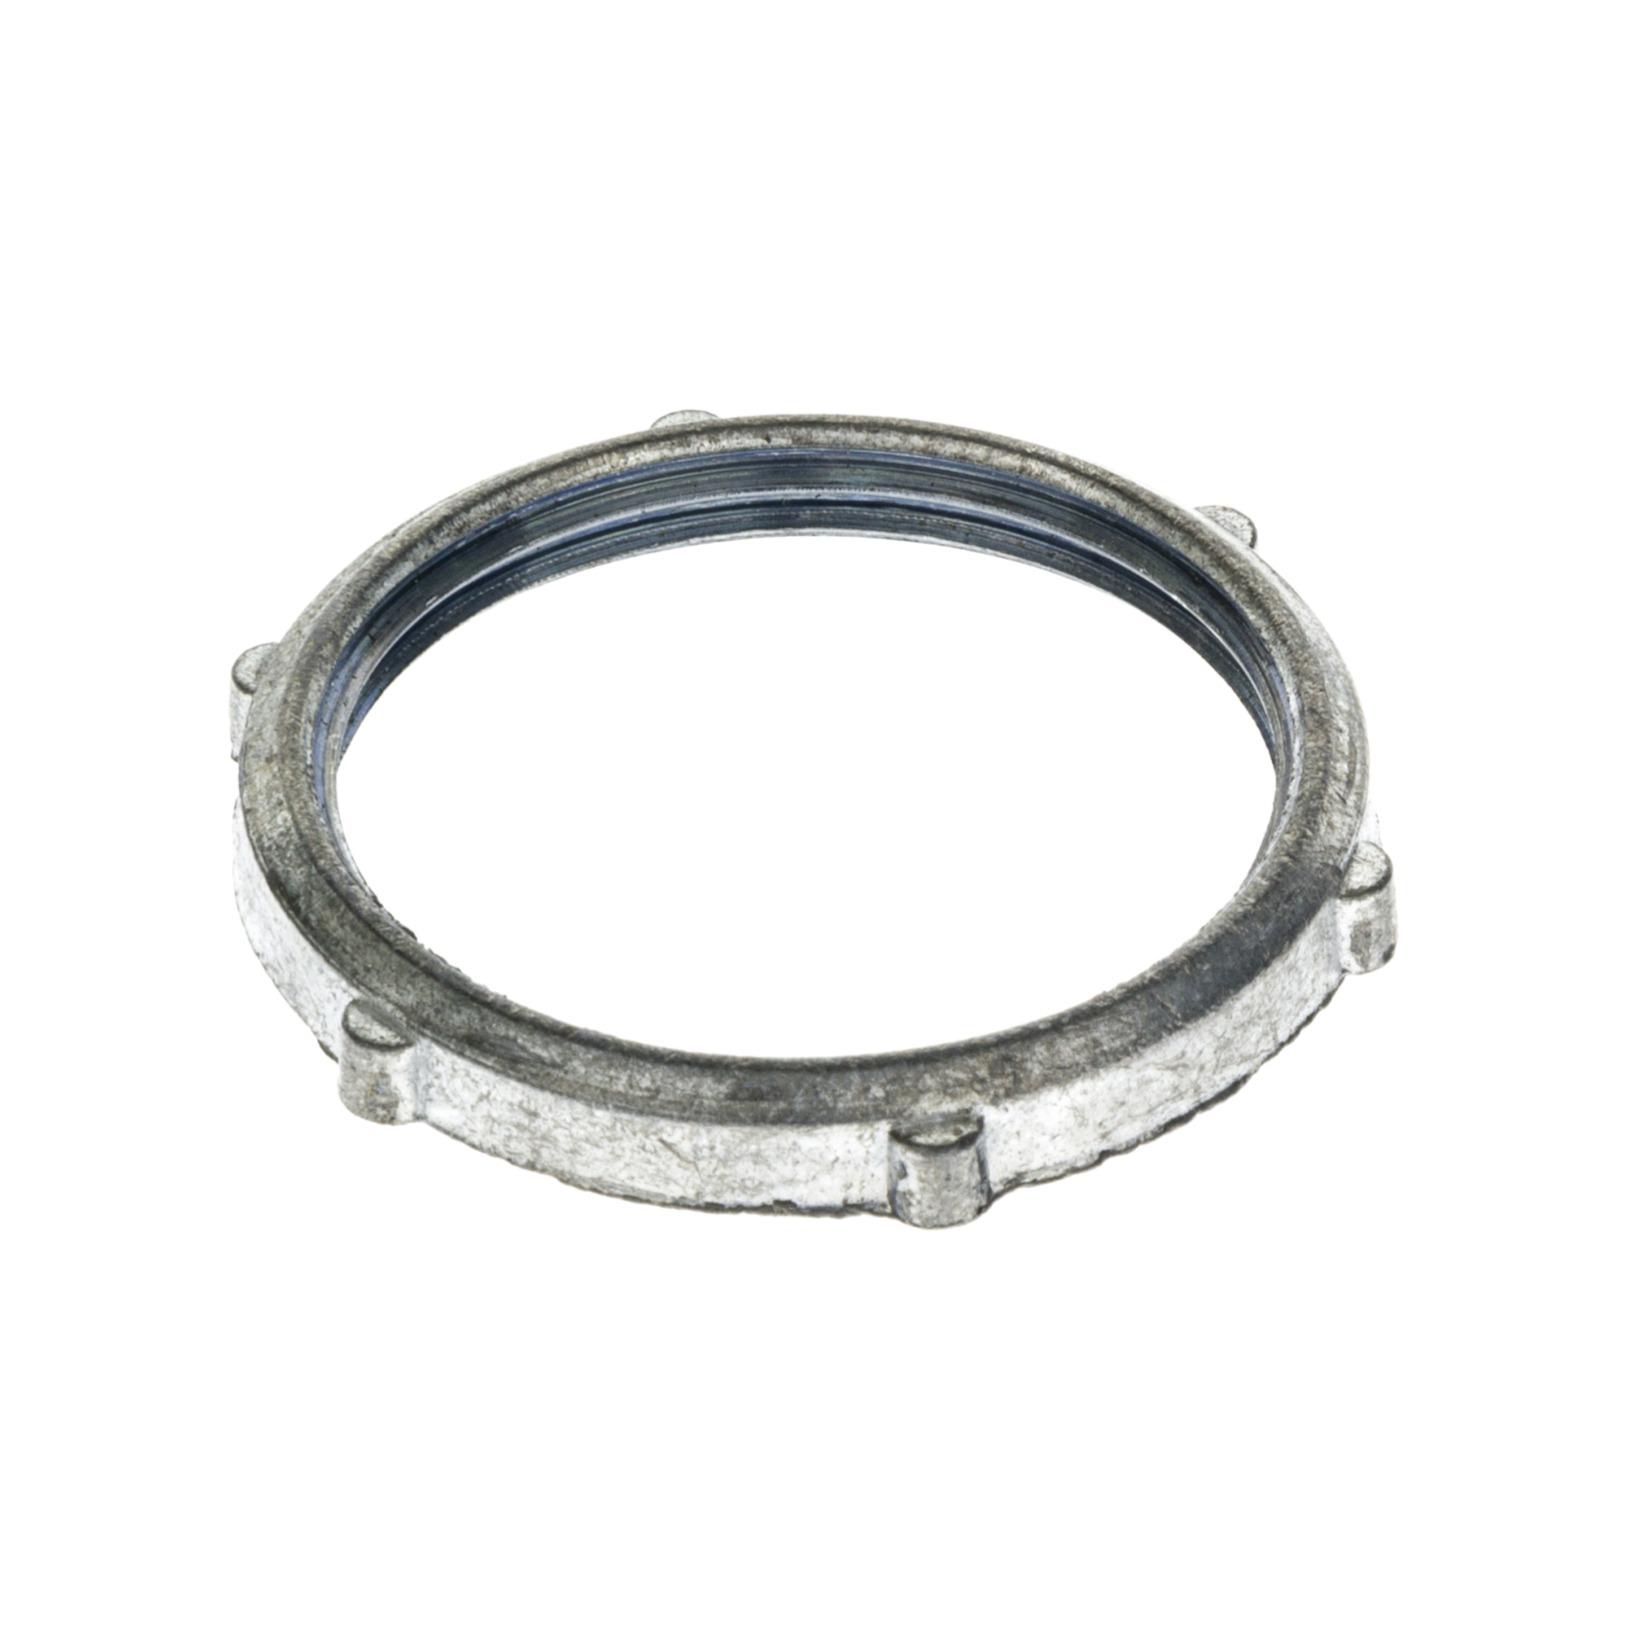 Arruela Roscavel 114 Aluminio Cinza - Mavel